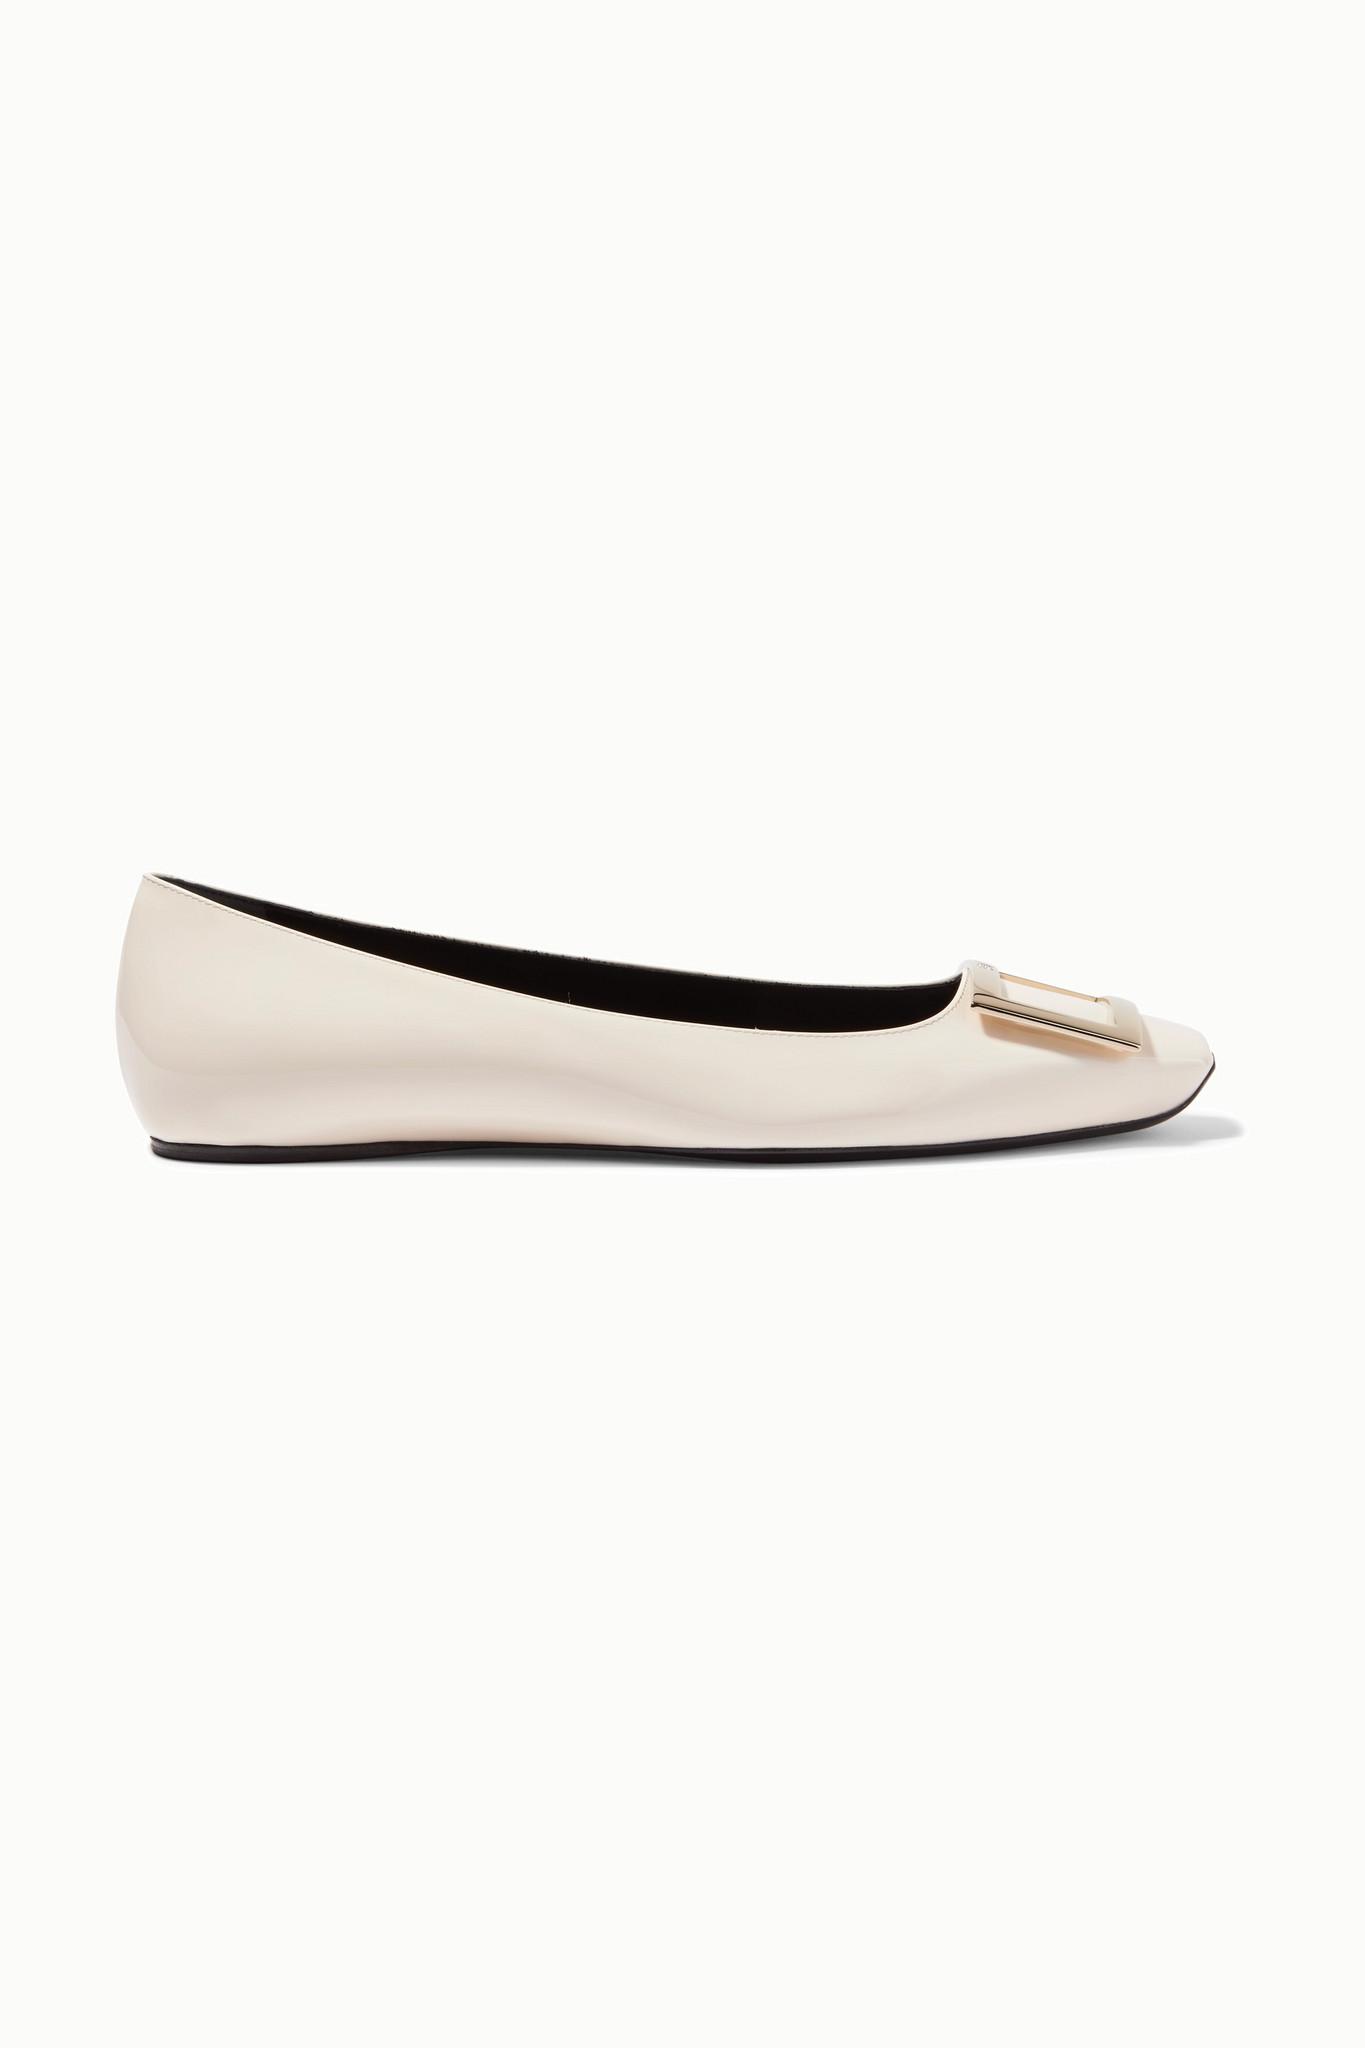 ROGER VIVIER - Trompette Bellerine Patent-leather Ballet Flats - White - IT40